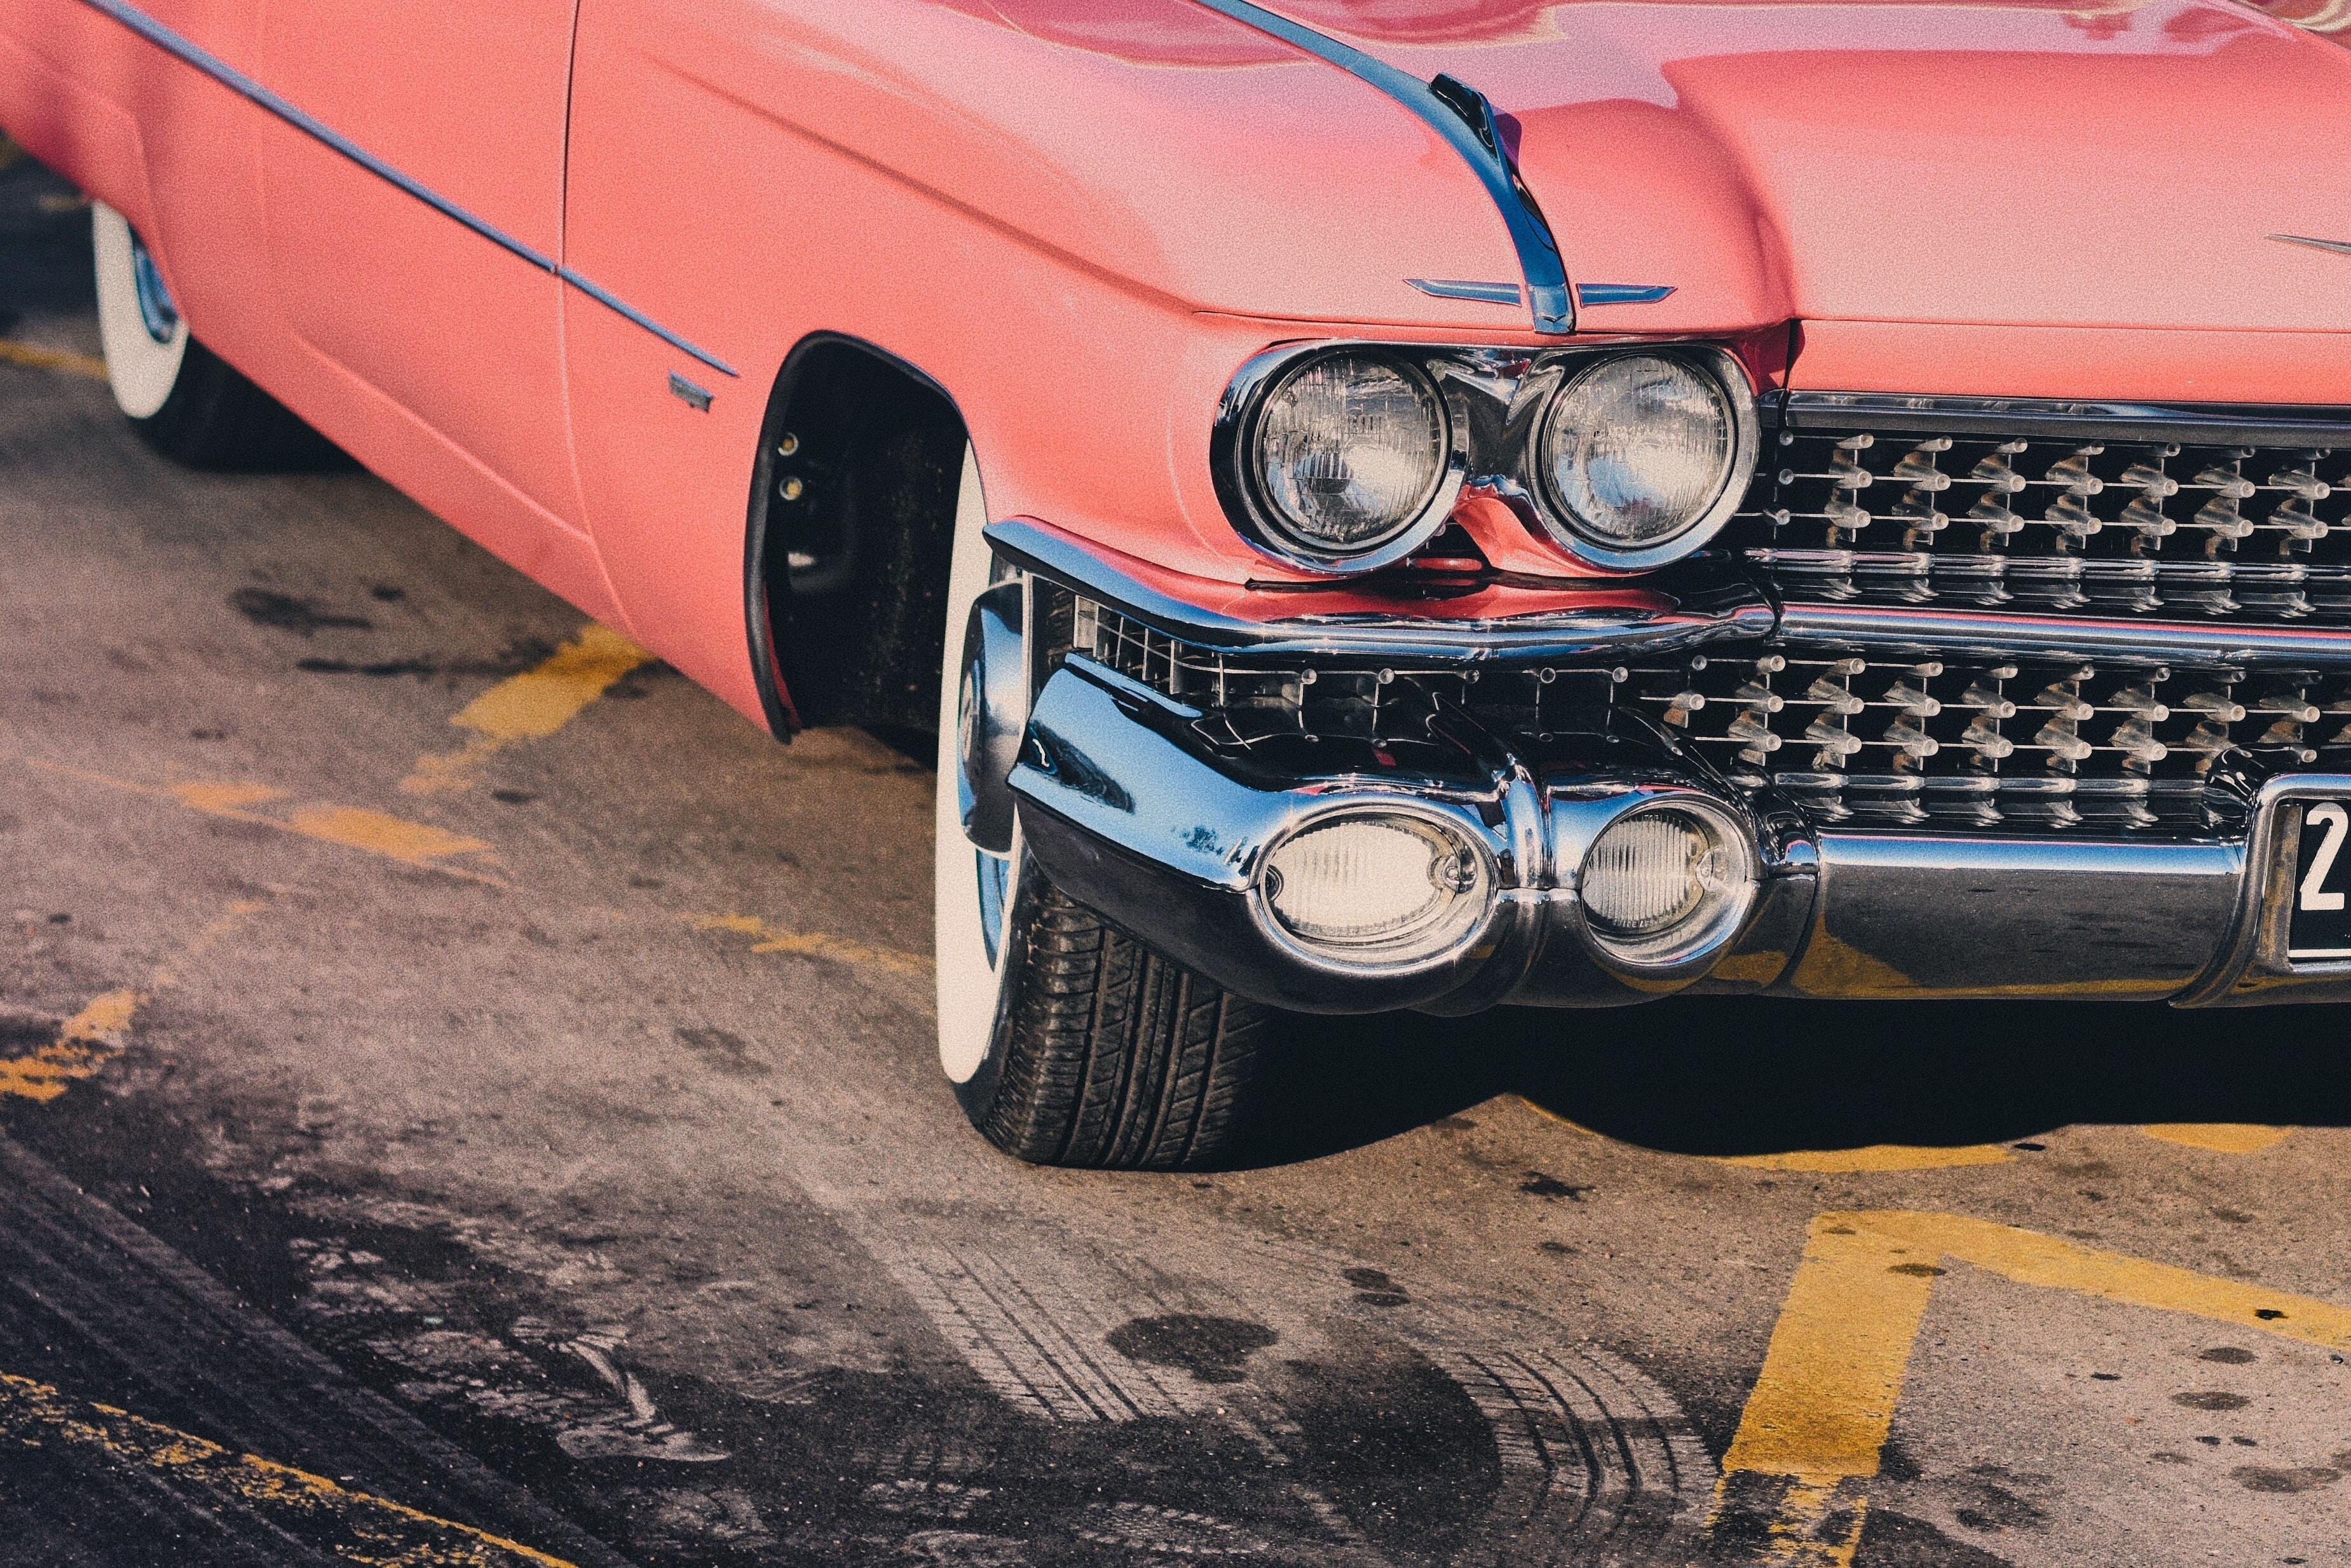 closeup photography of pink vehicle